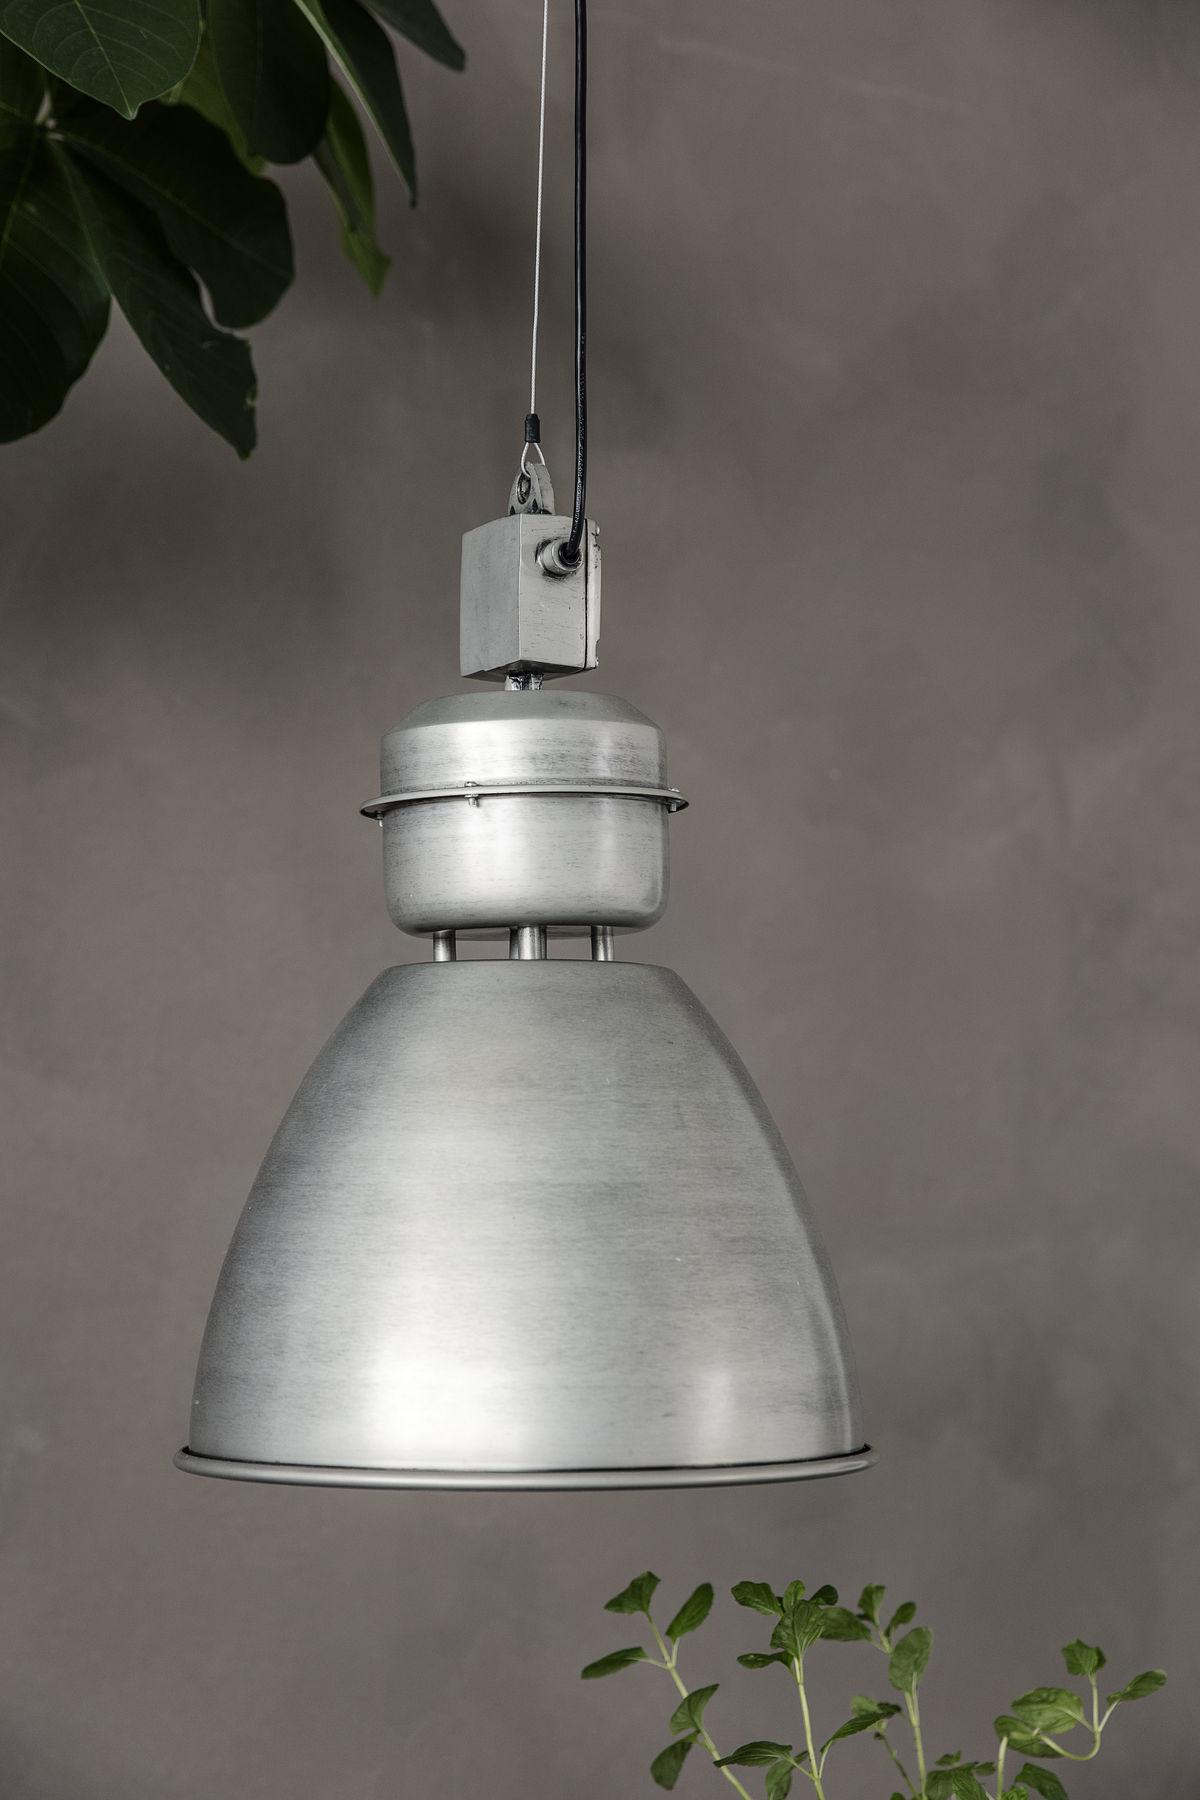 House Doctor Lámpara Industrial de Metal - Estilo Fábrica - Gris - Ø35xh52cm - House Doctor